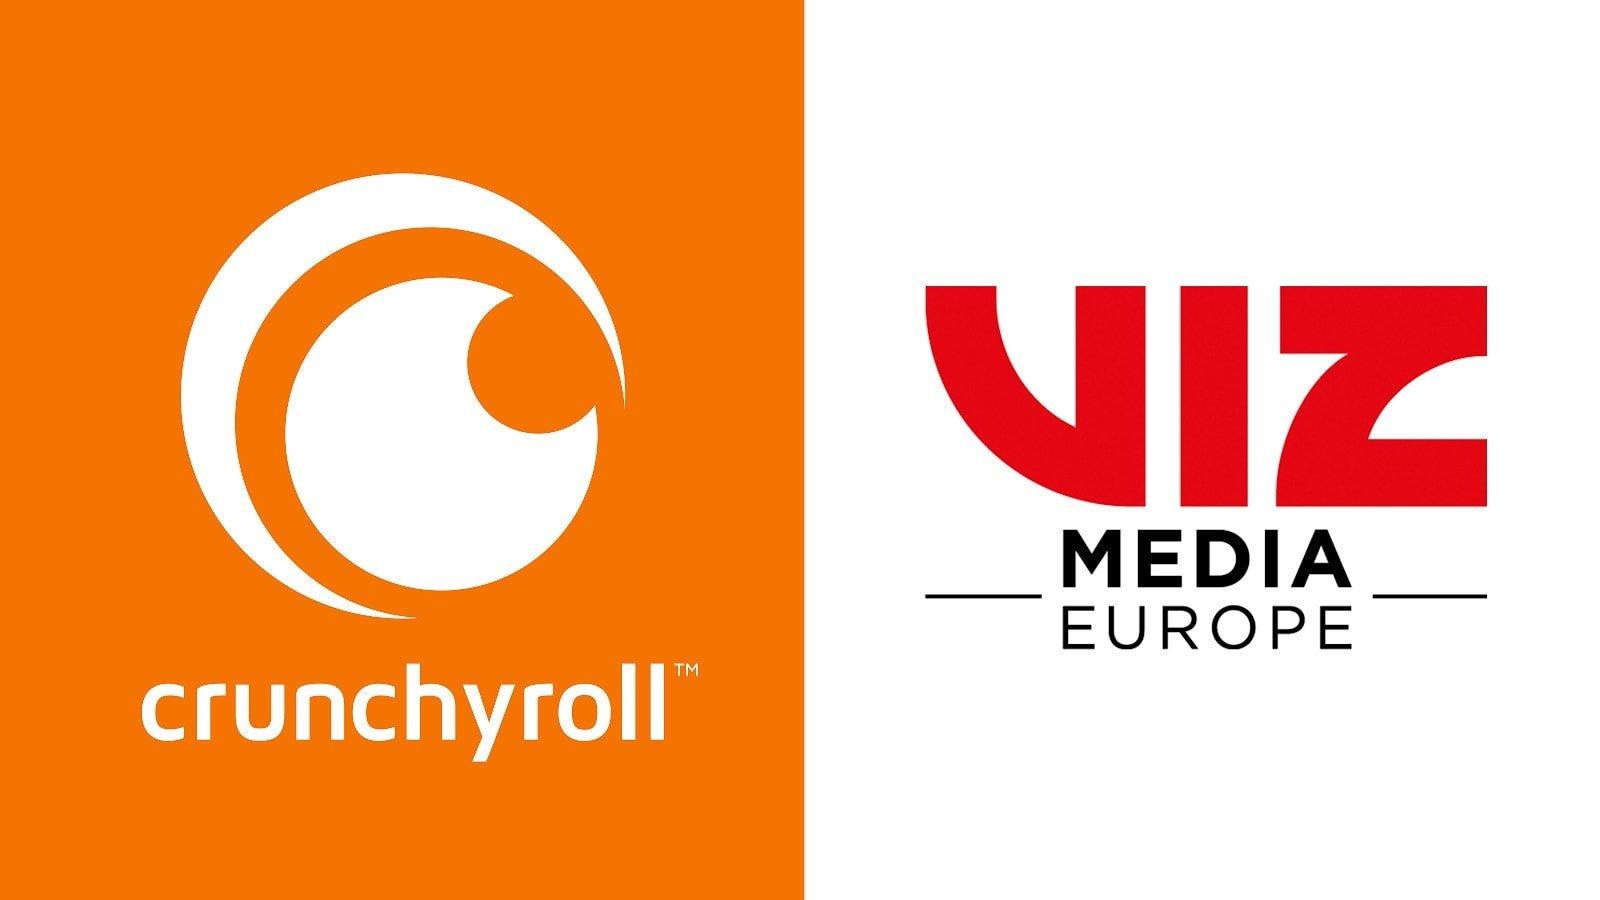 Crunchyroll Gains Majority Stake In Viz Media Europe